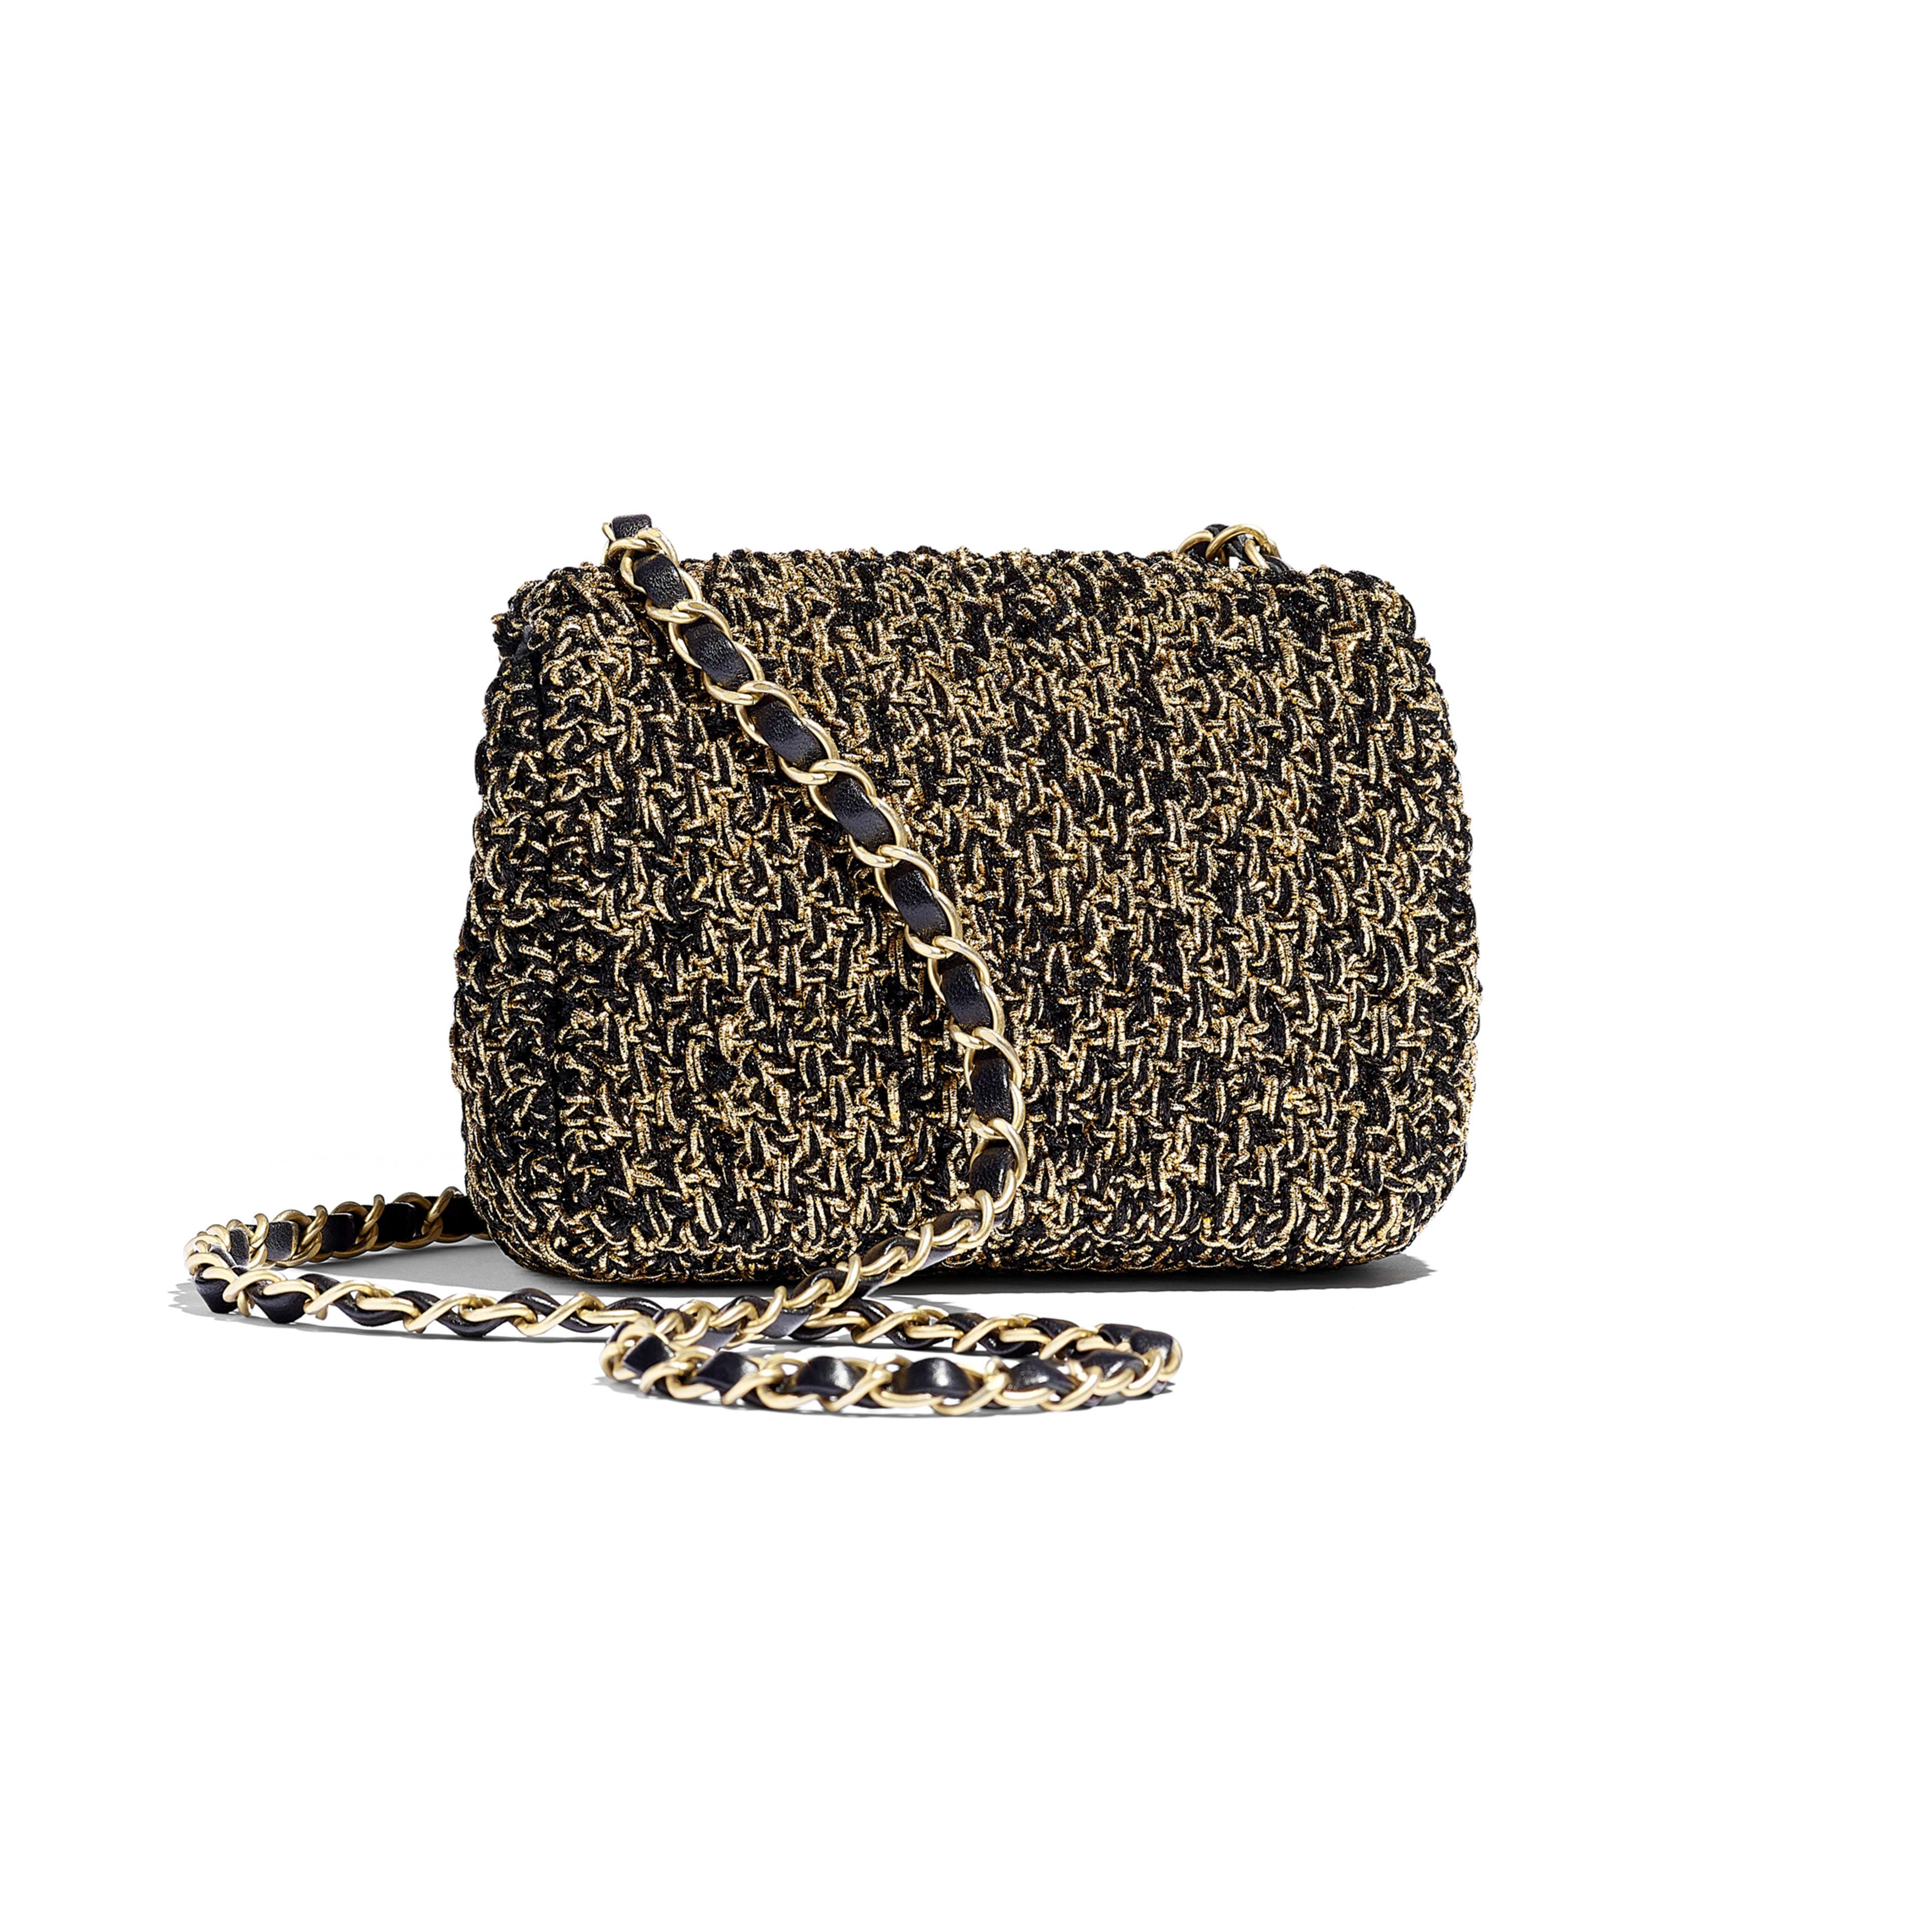 Mini Flap Bag - Black & Gold - Cotton, Mixed Fibers & Gold-Tone Metal - Alternative view - see full sized version